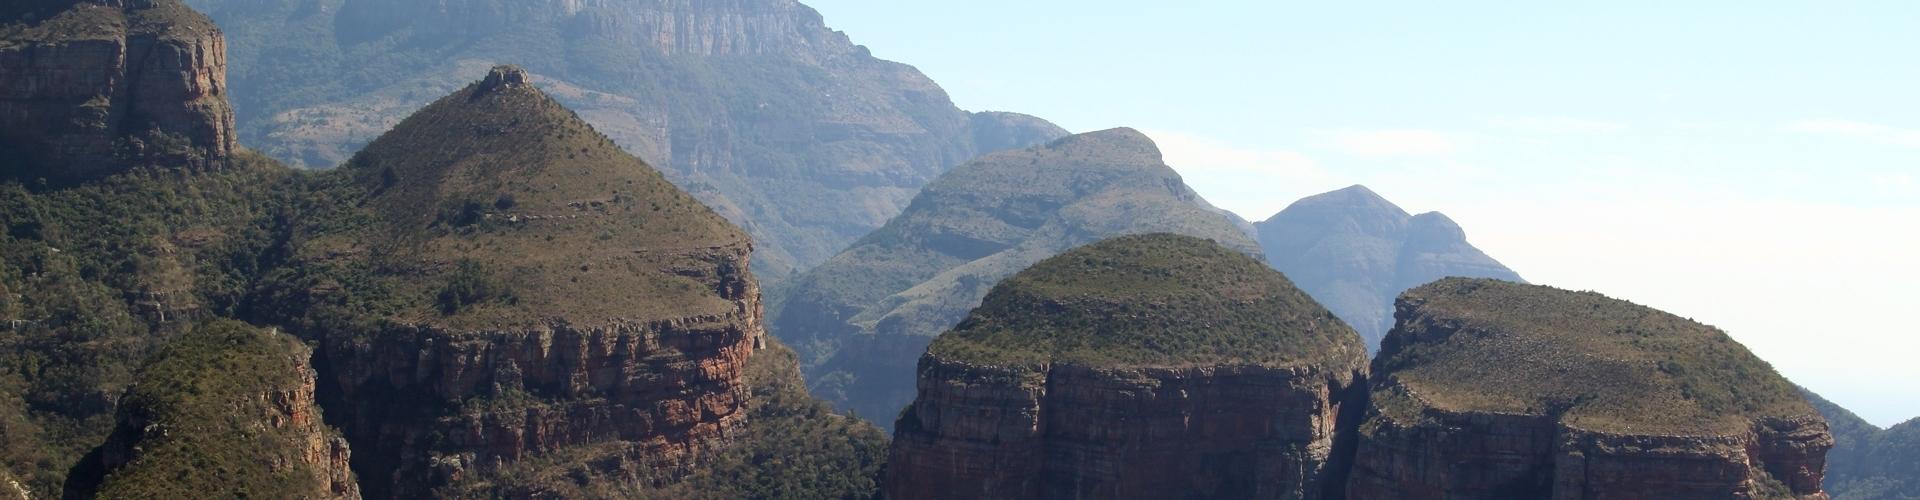 header-provincie-mpumalanga-panorama-route-krugerpark-rondalvels-informatie-zuid-afrika-1920x500-1